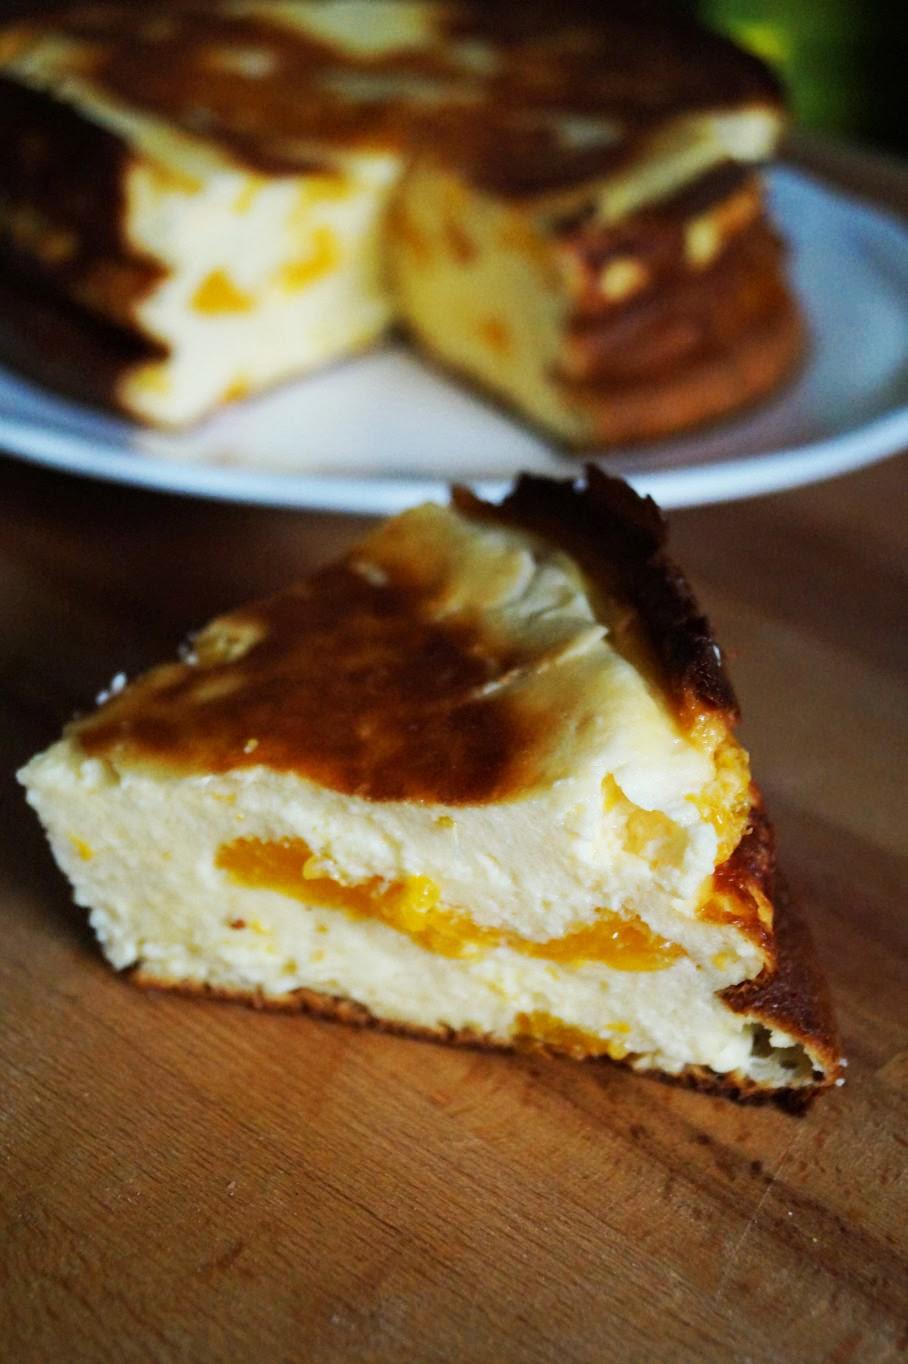 Einfacher käsekuchen mit mandarinen